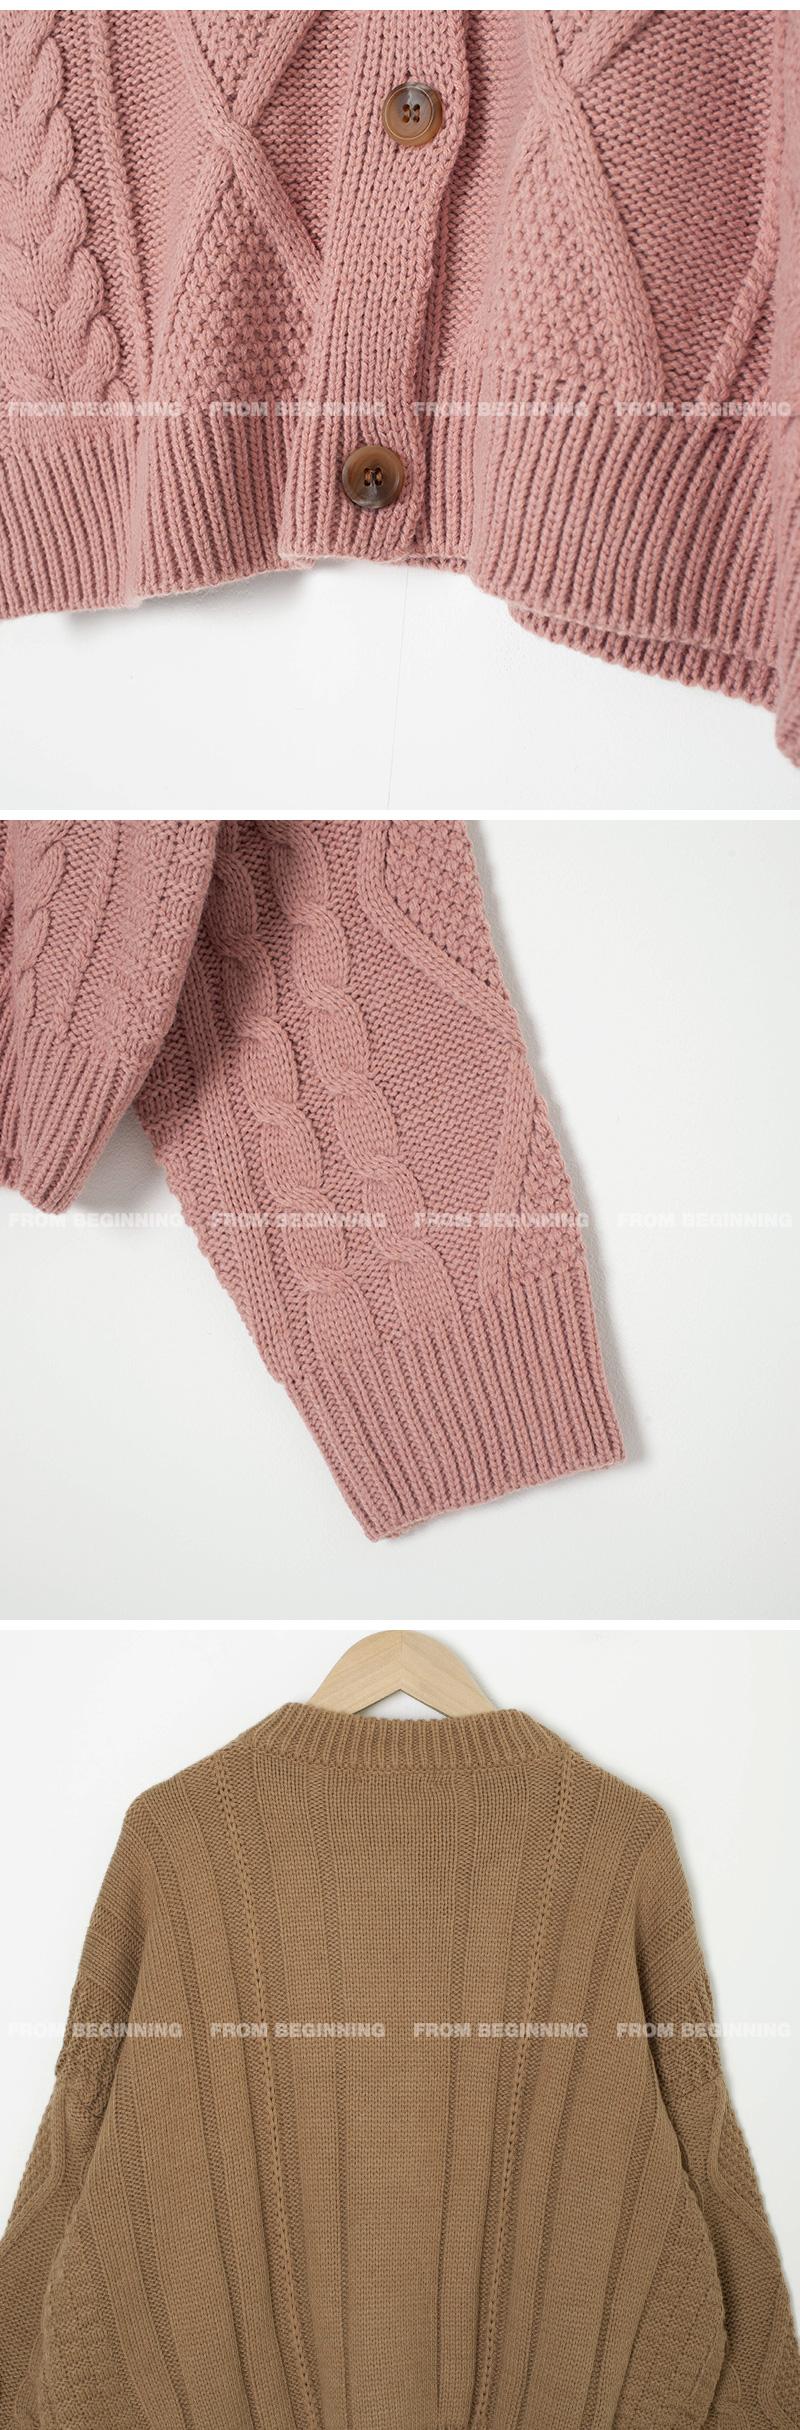 Diamond Cable Knitwear Cardigan